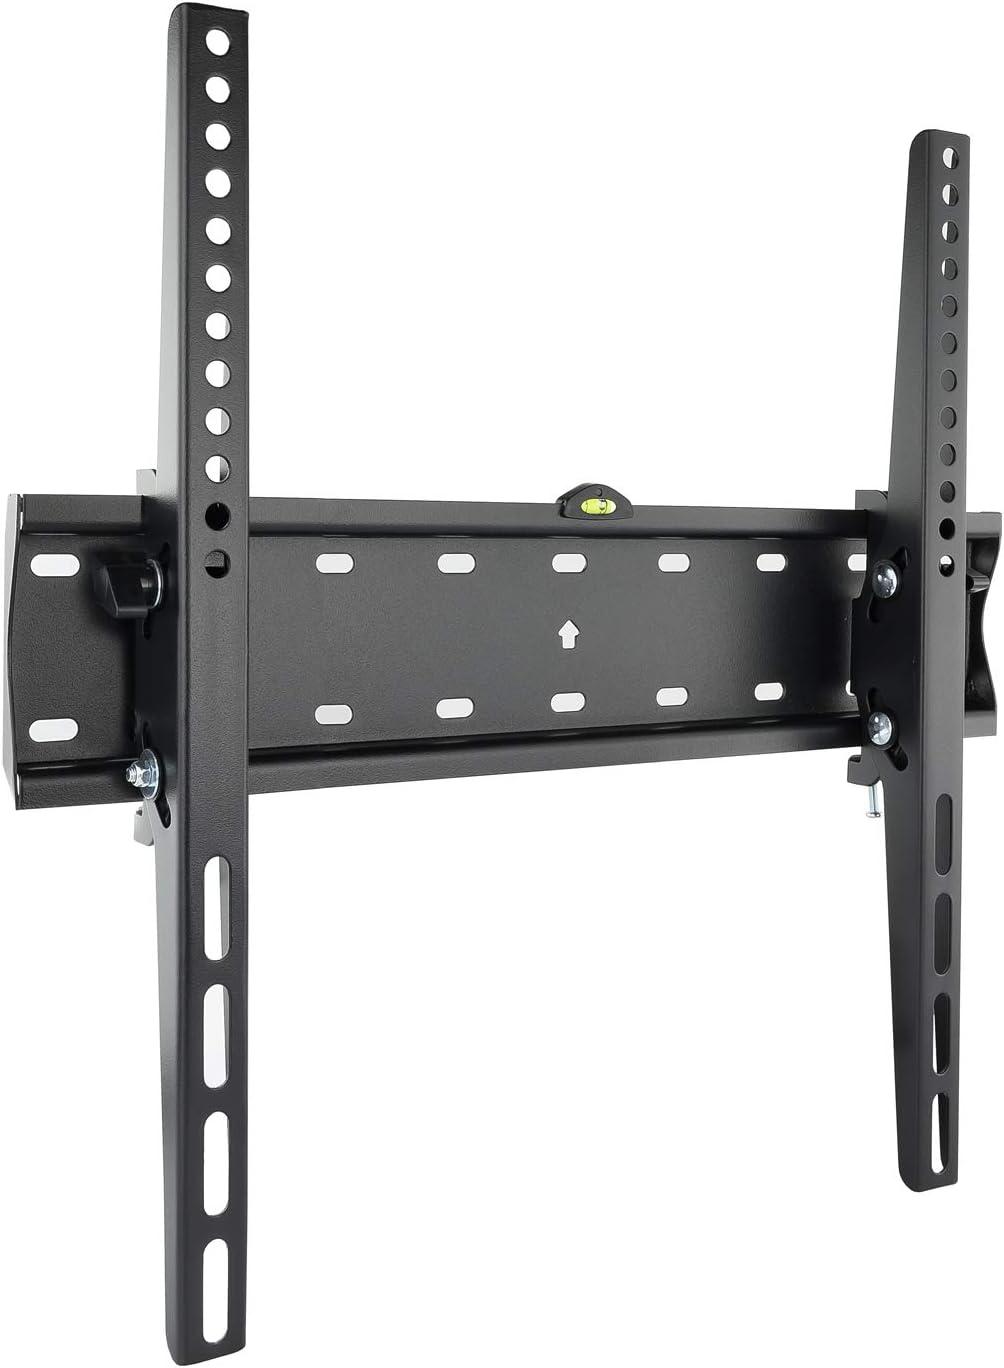 TooQ LP4255T-B - Soporte fijo inclinable de pared (monitor / plasma / LCD / LED) 32